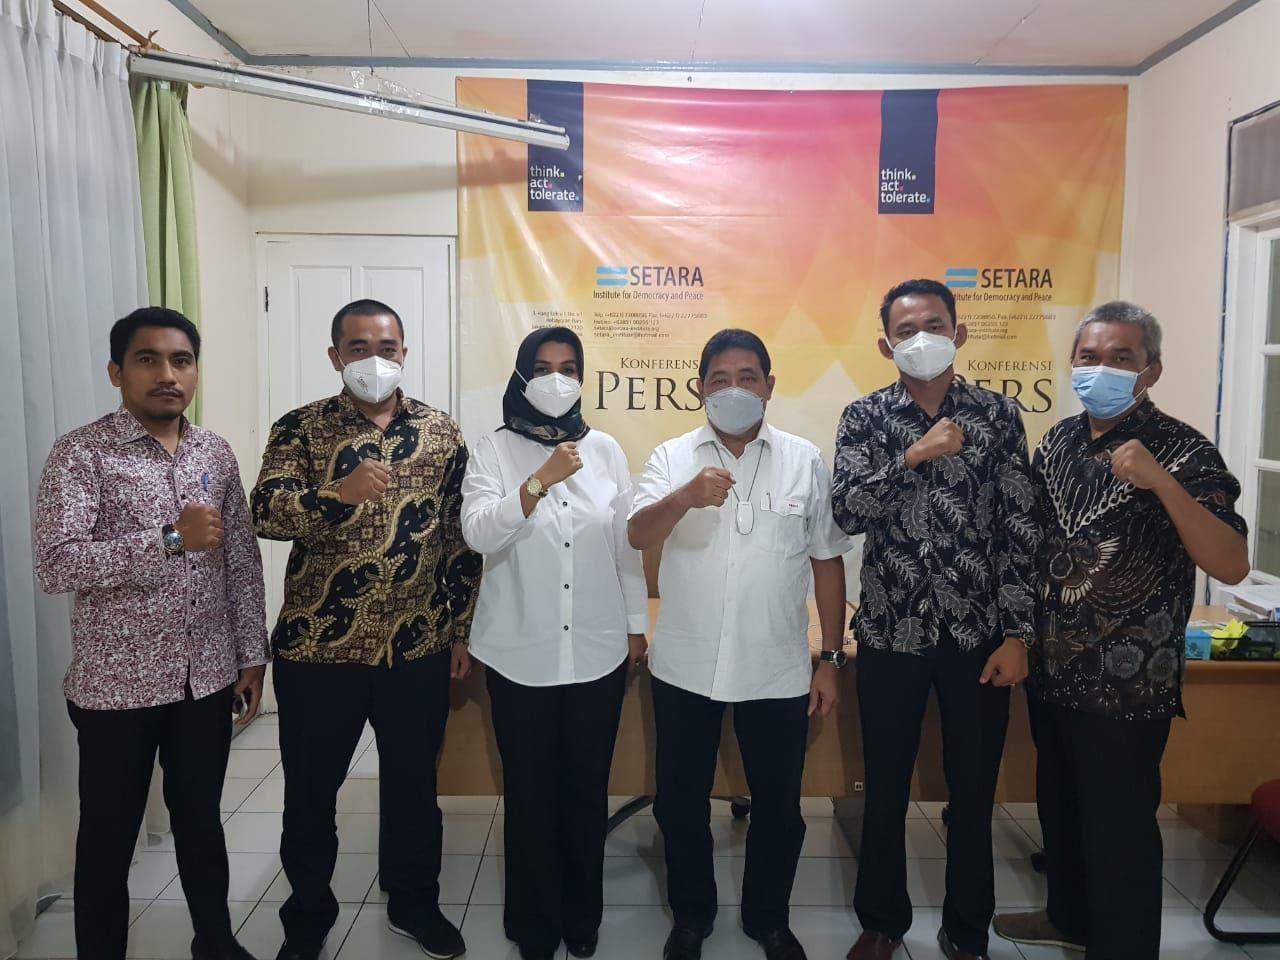 Kopsa Mandiri Hadapi Tekanan dan Ancaman Usai Laporkan Dugaan Korupsi PTPN 5